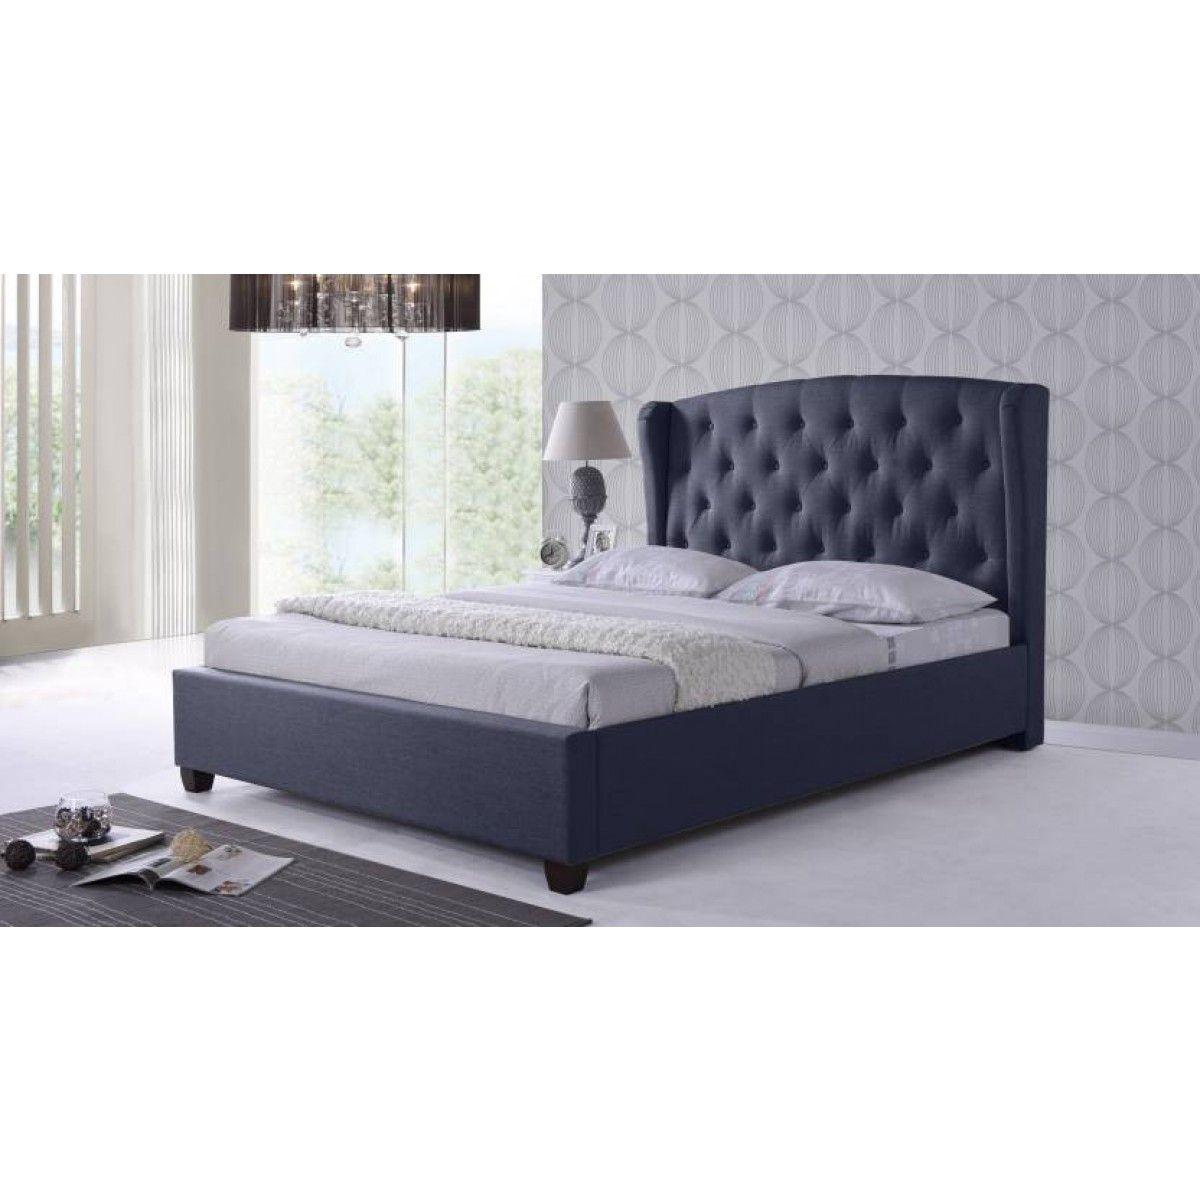 Gorevizon Holmebrook Upholstered Engineered Wooden King Size Bed Wooden King Size Bed Bed Design Full Size Bed